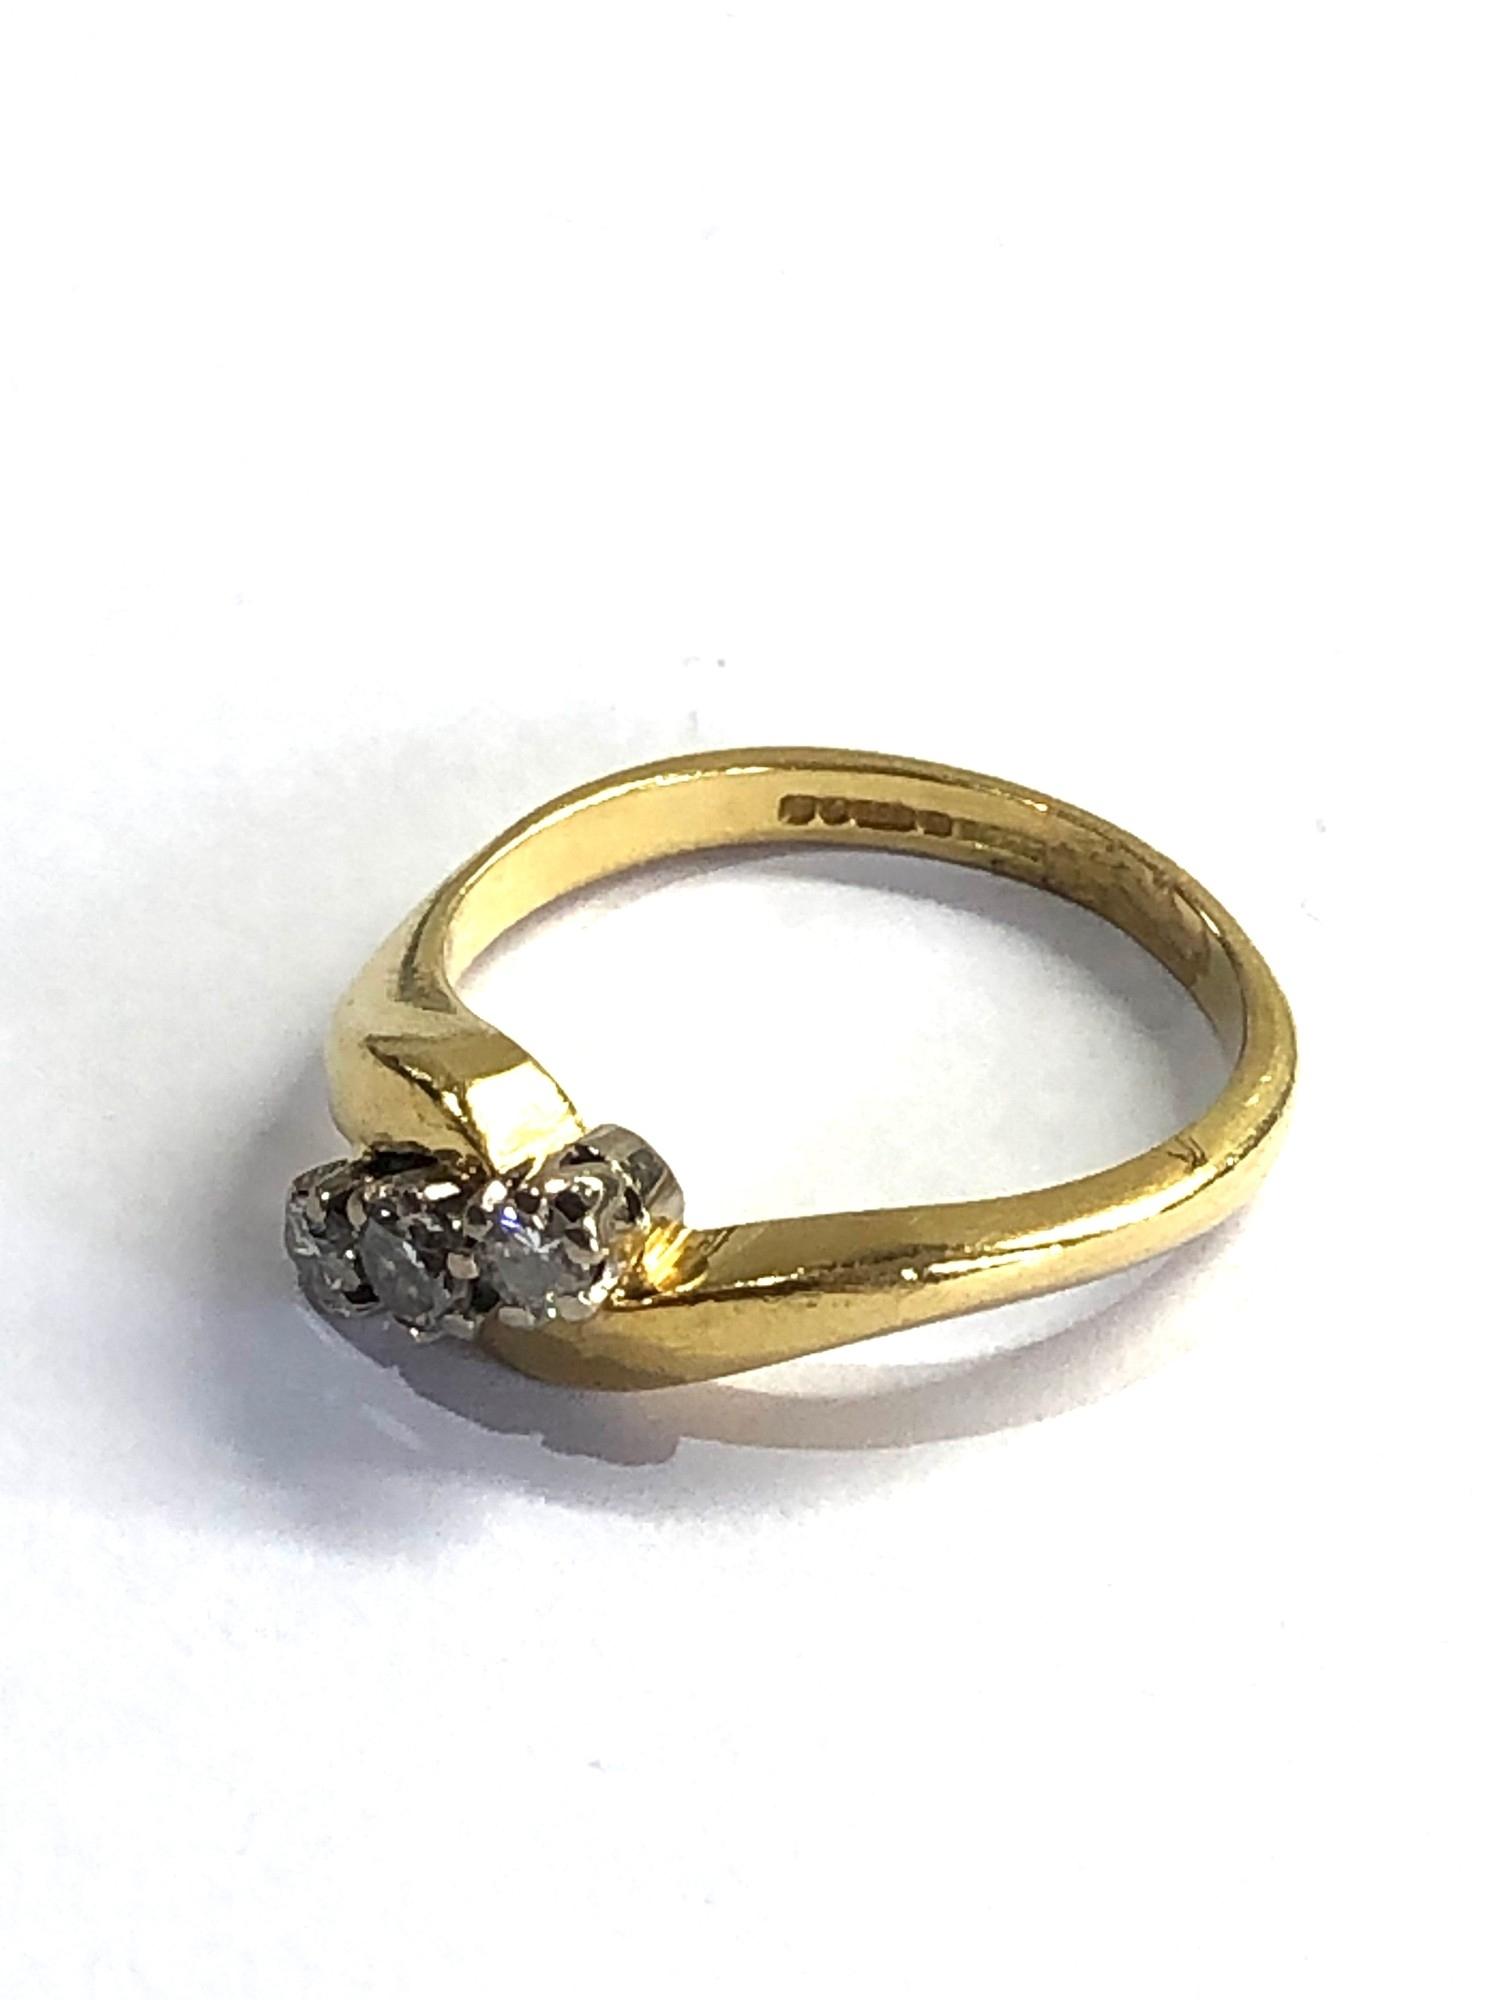 18ct gold diamond ring 0.25ct diamonds weight 4.3g - Image 2 of 4